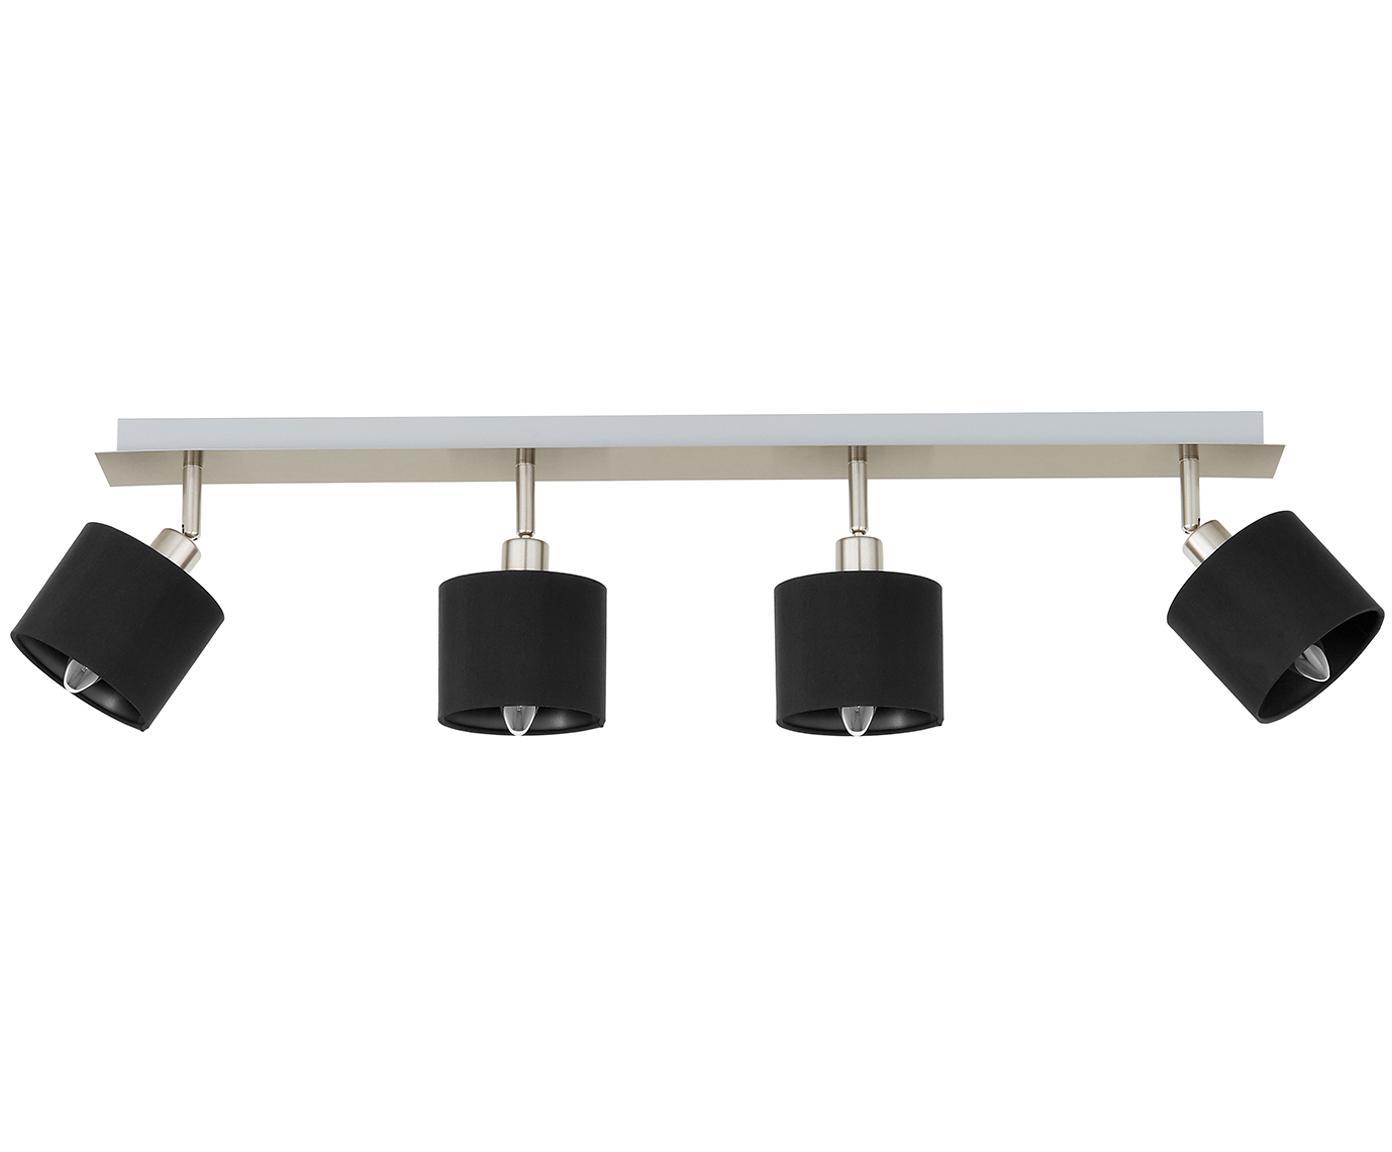 Faretti da soffitto Casper, Baldacchino: metallo, nichelato, Paralume: tessuto, Argentato, nero, Larg. 78 x Alt. 7 cm